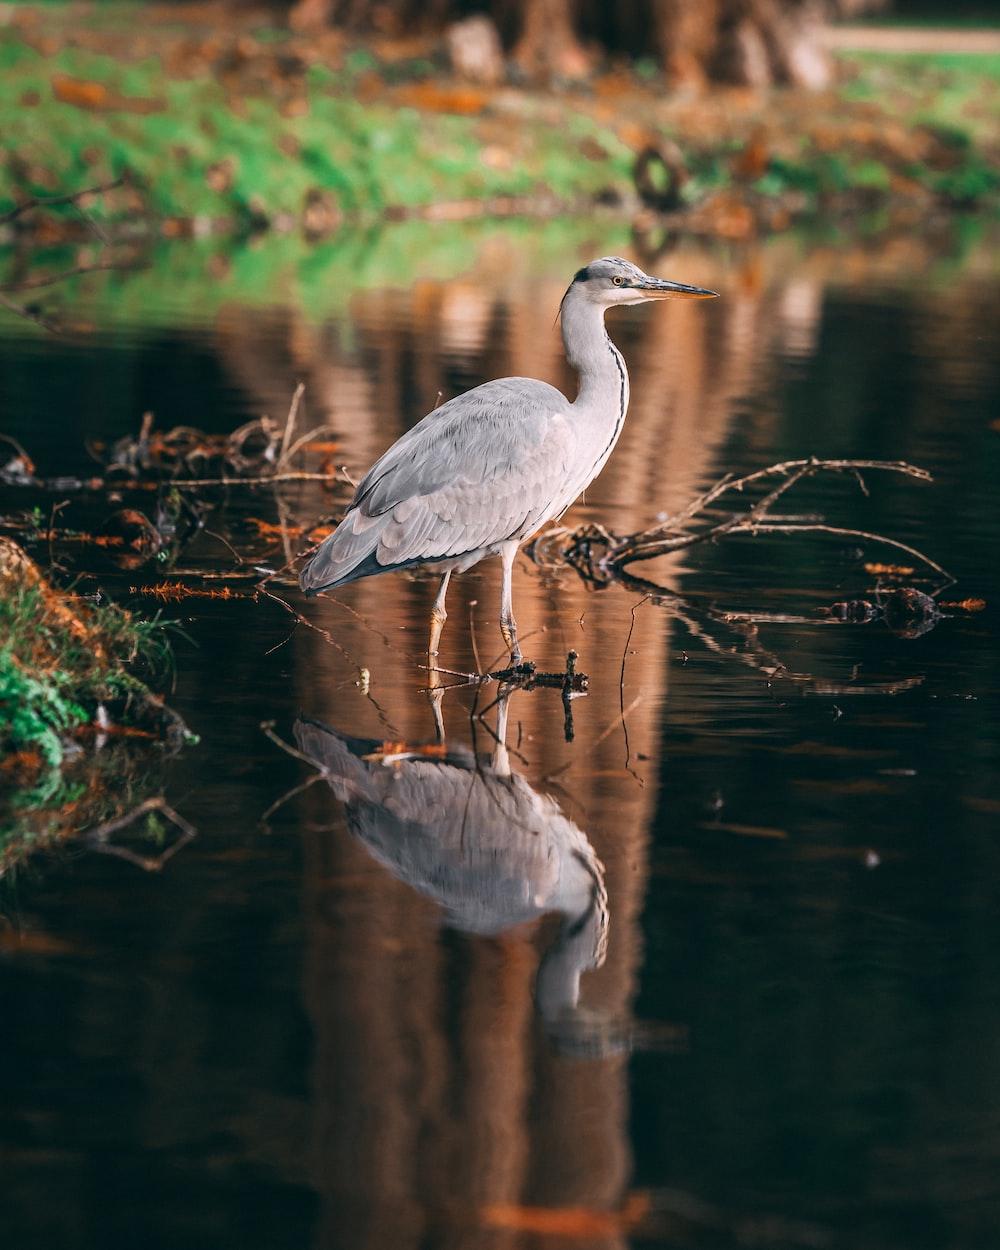 white bird on body of water near land